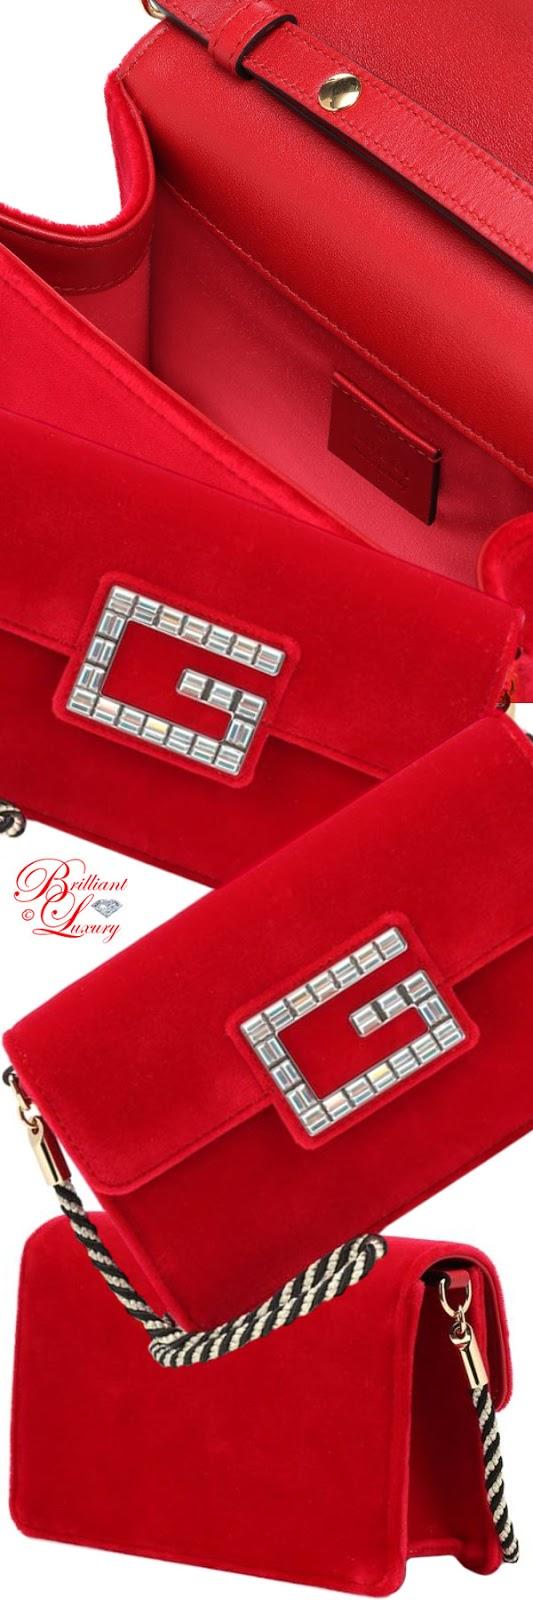 Brilliant Luxury ♦ PANTONE Fashion Color SS 2019 ~ Fiesta ♦ Gucci velvet shoulder bag #red